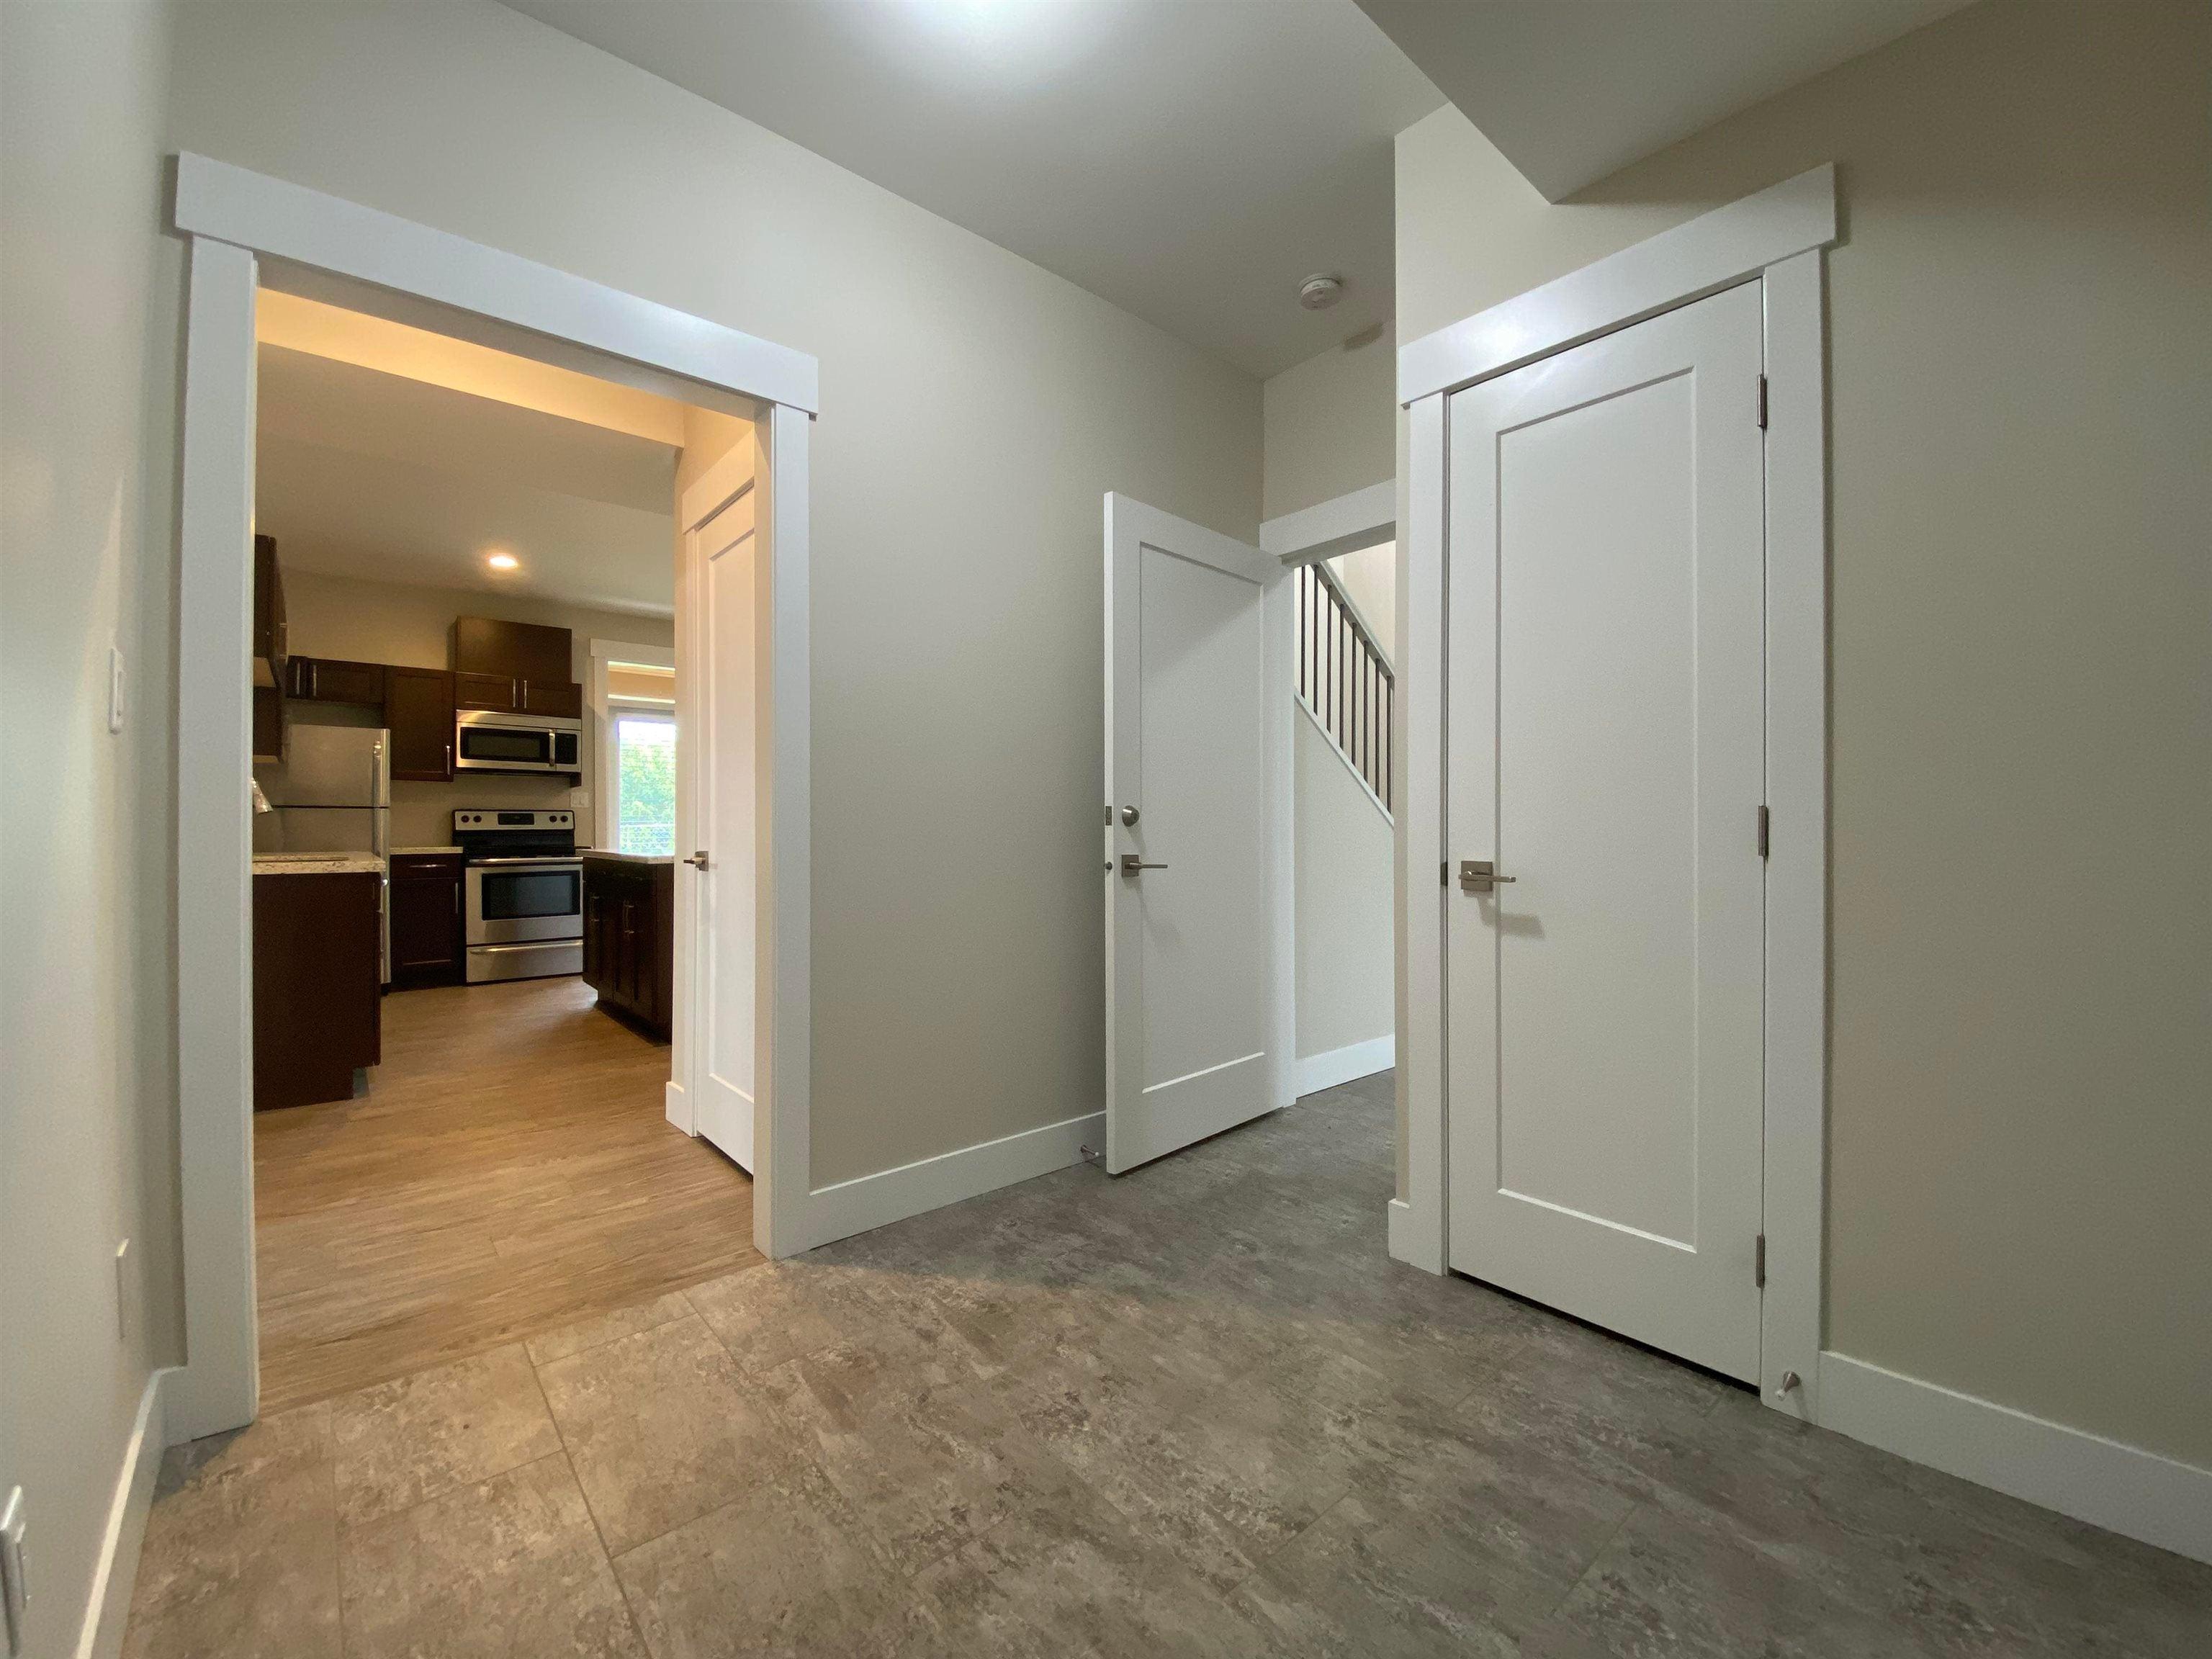 10144 KILLARNEY DRIVE - Fairfield Island House/Single Family for sale, 5 Bedrooms (R2625716) - #10